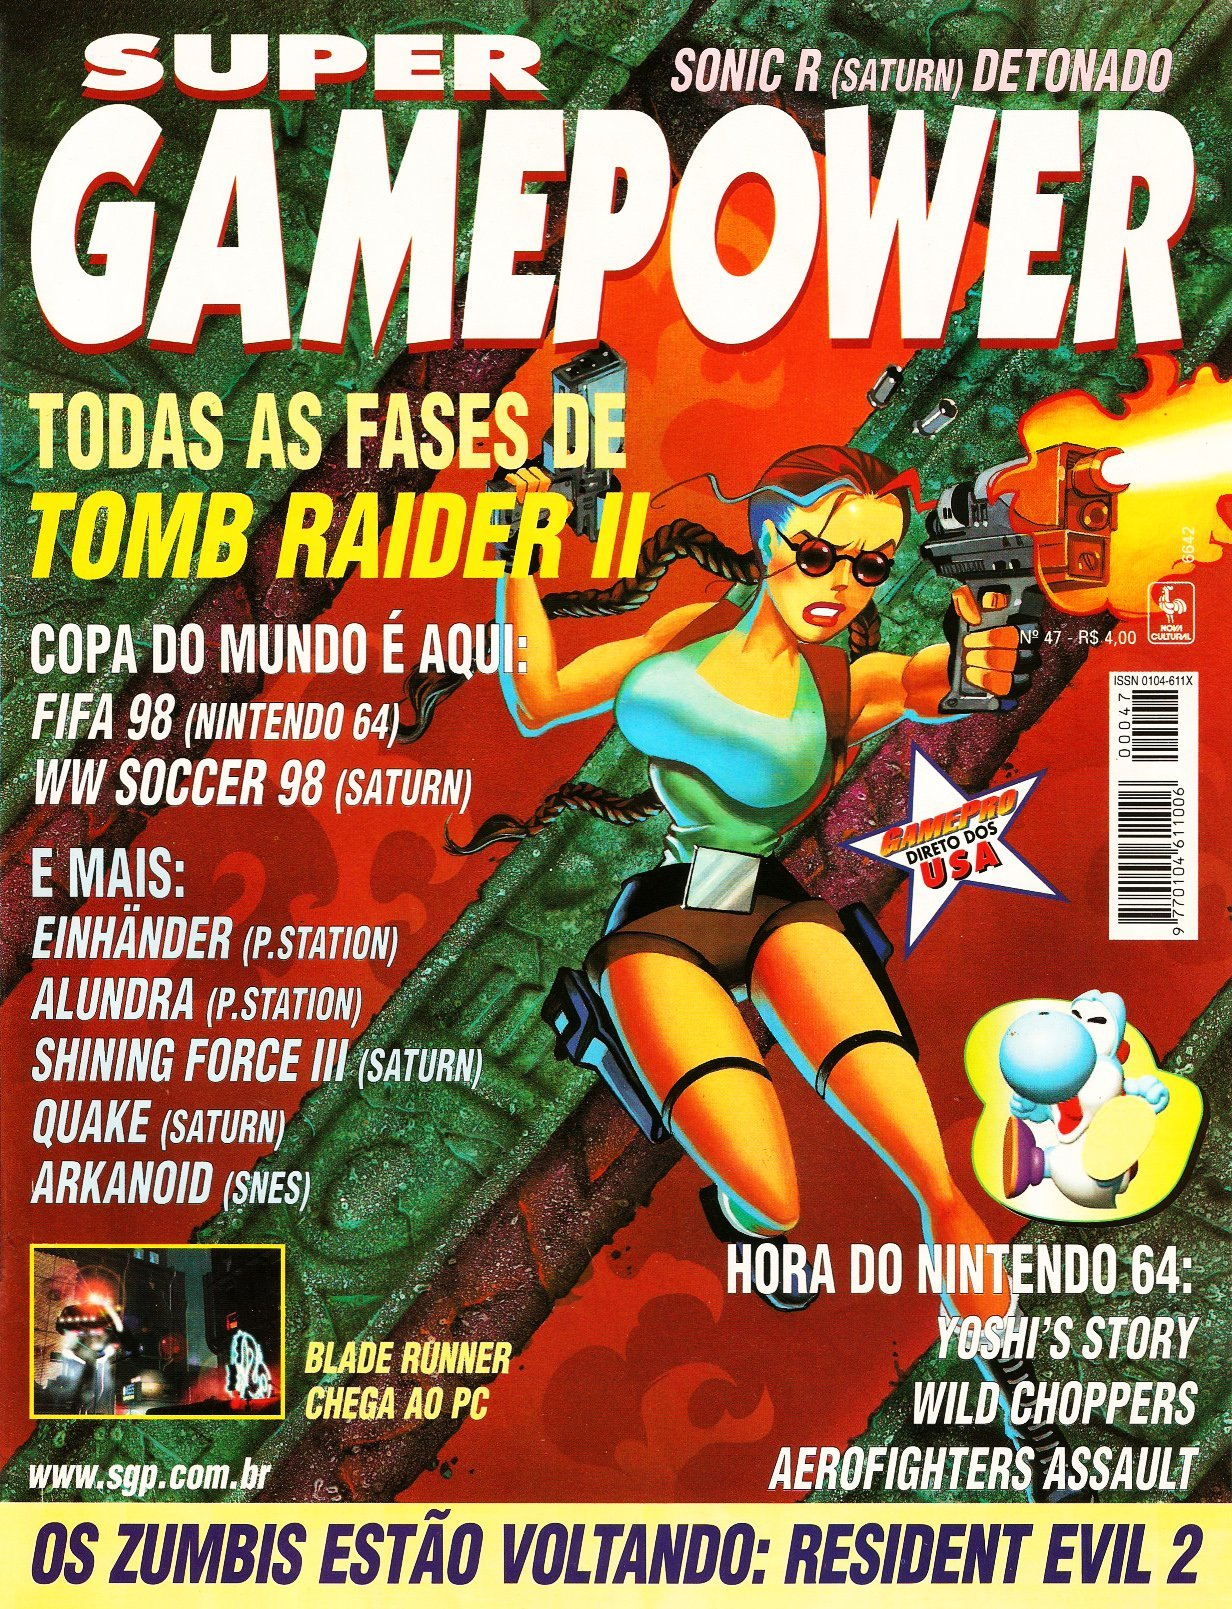 SuperGamePower Issue 047 (February 1998)